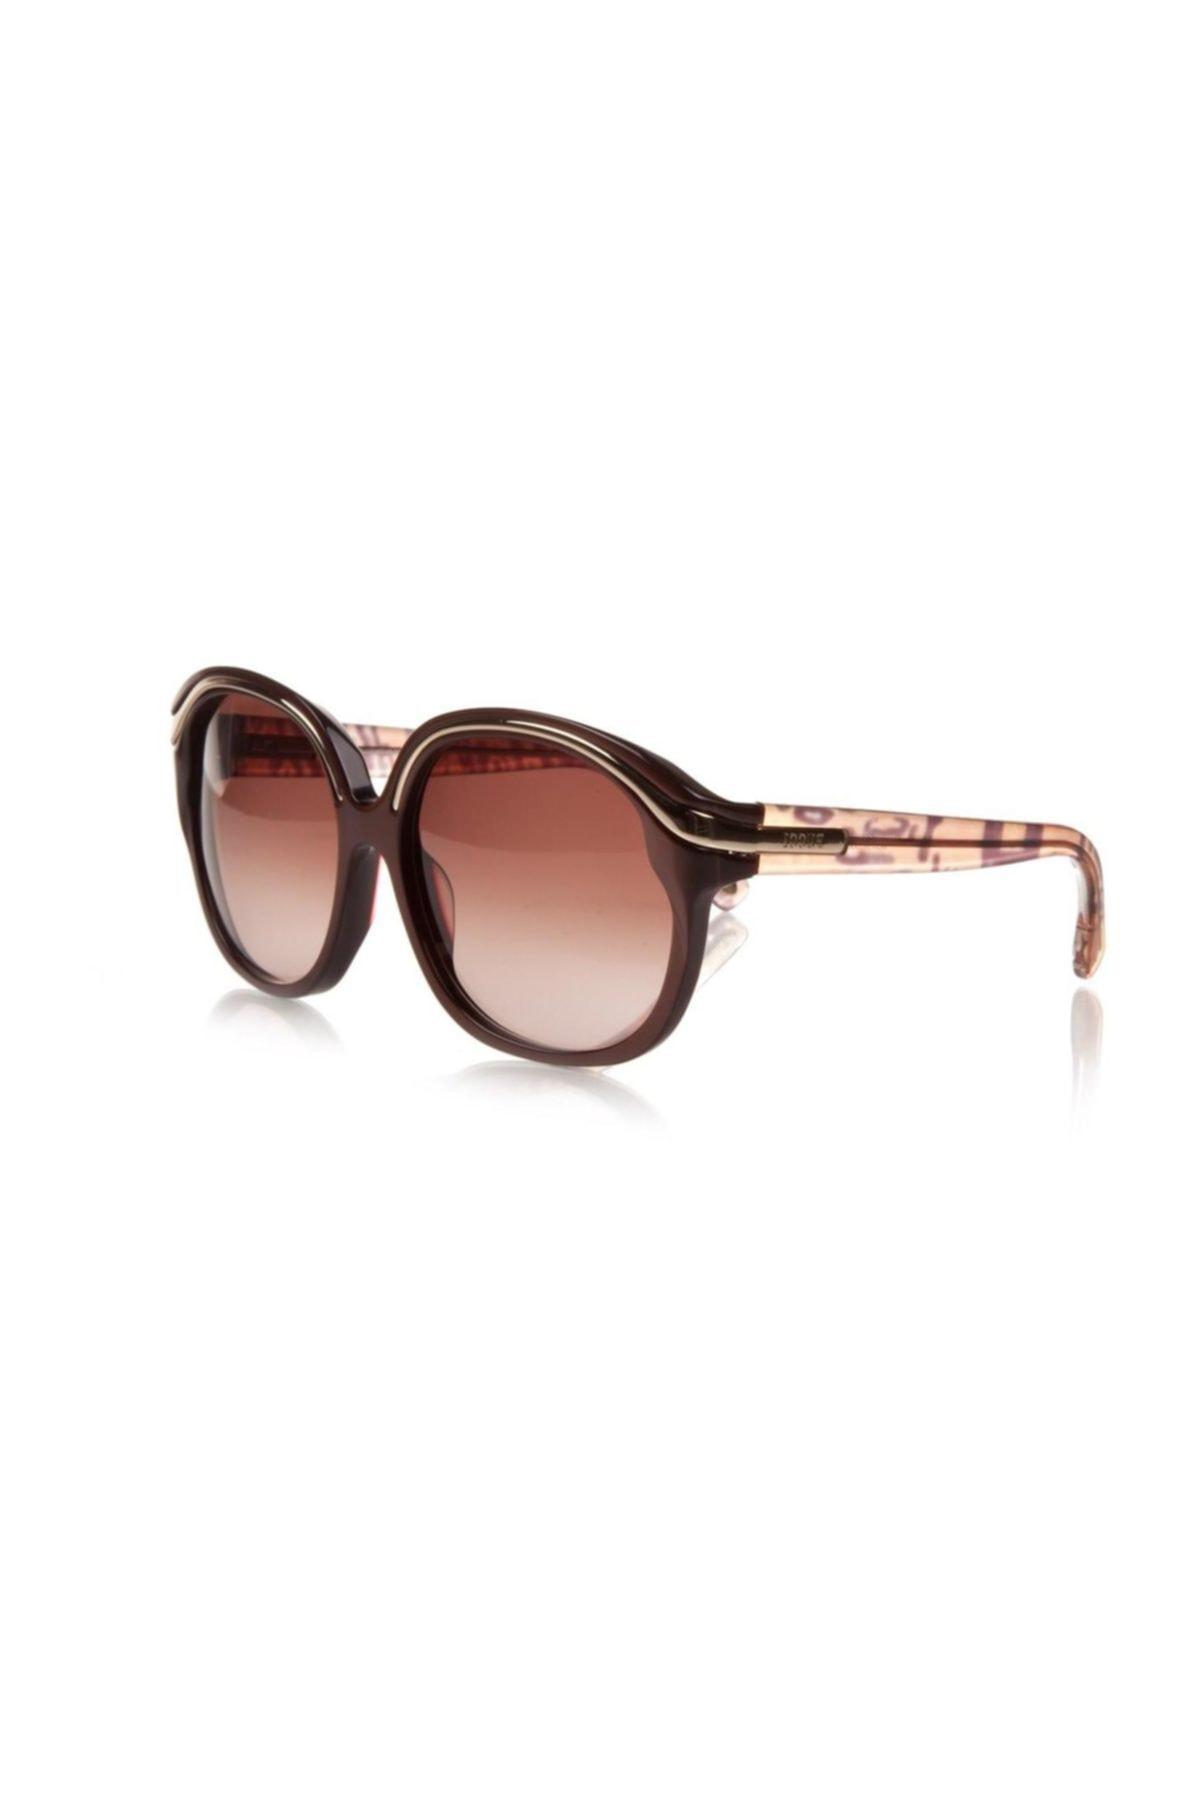 Emilio Pucci Kadın Dikdörtgen Güneş Gözlüğü Ep 689 210 2